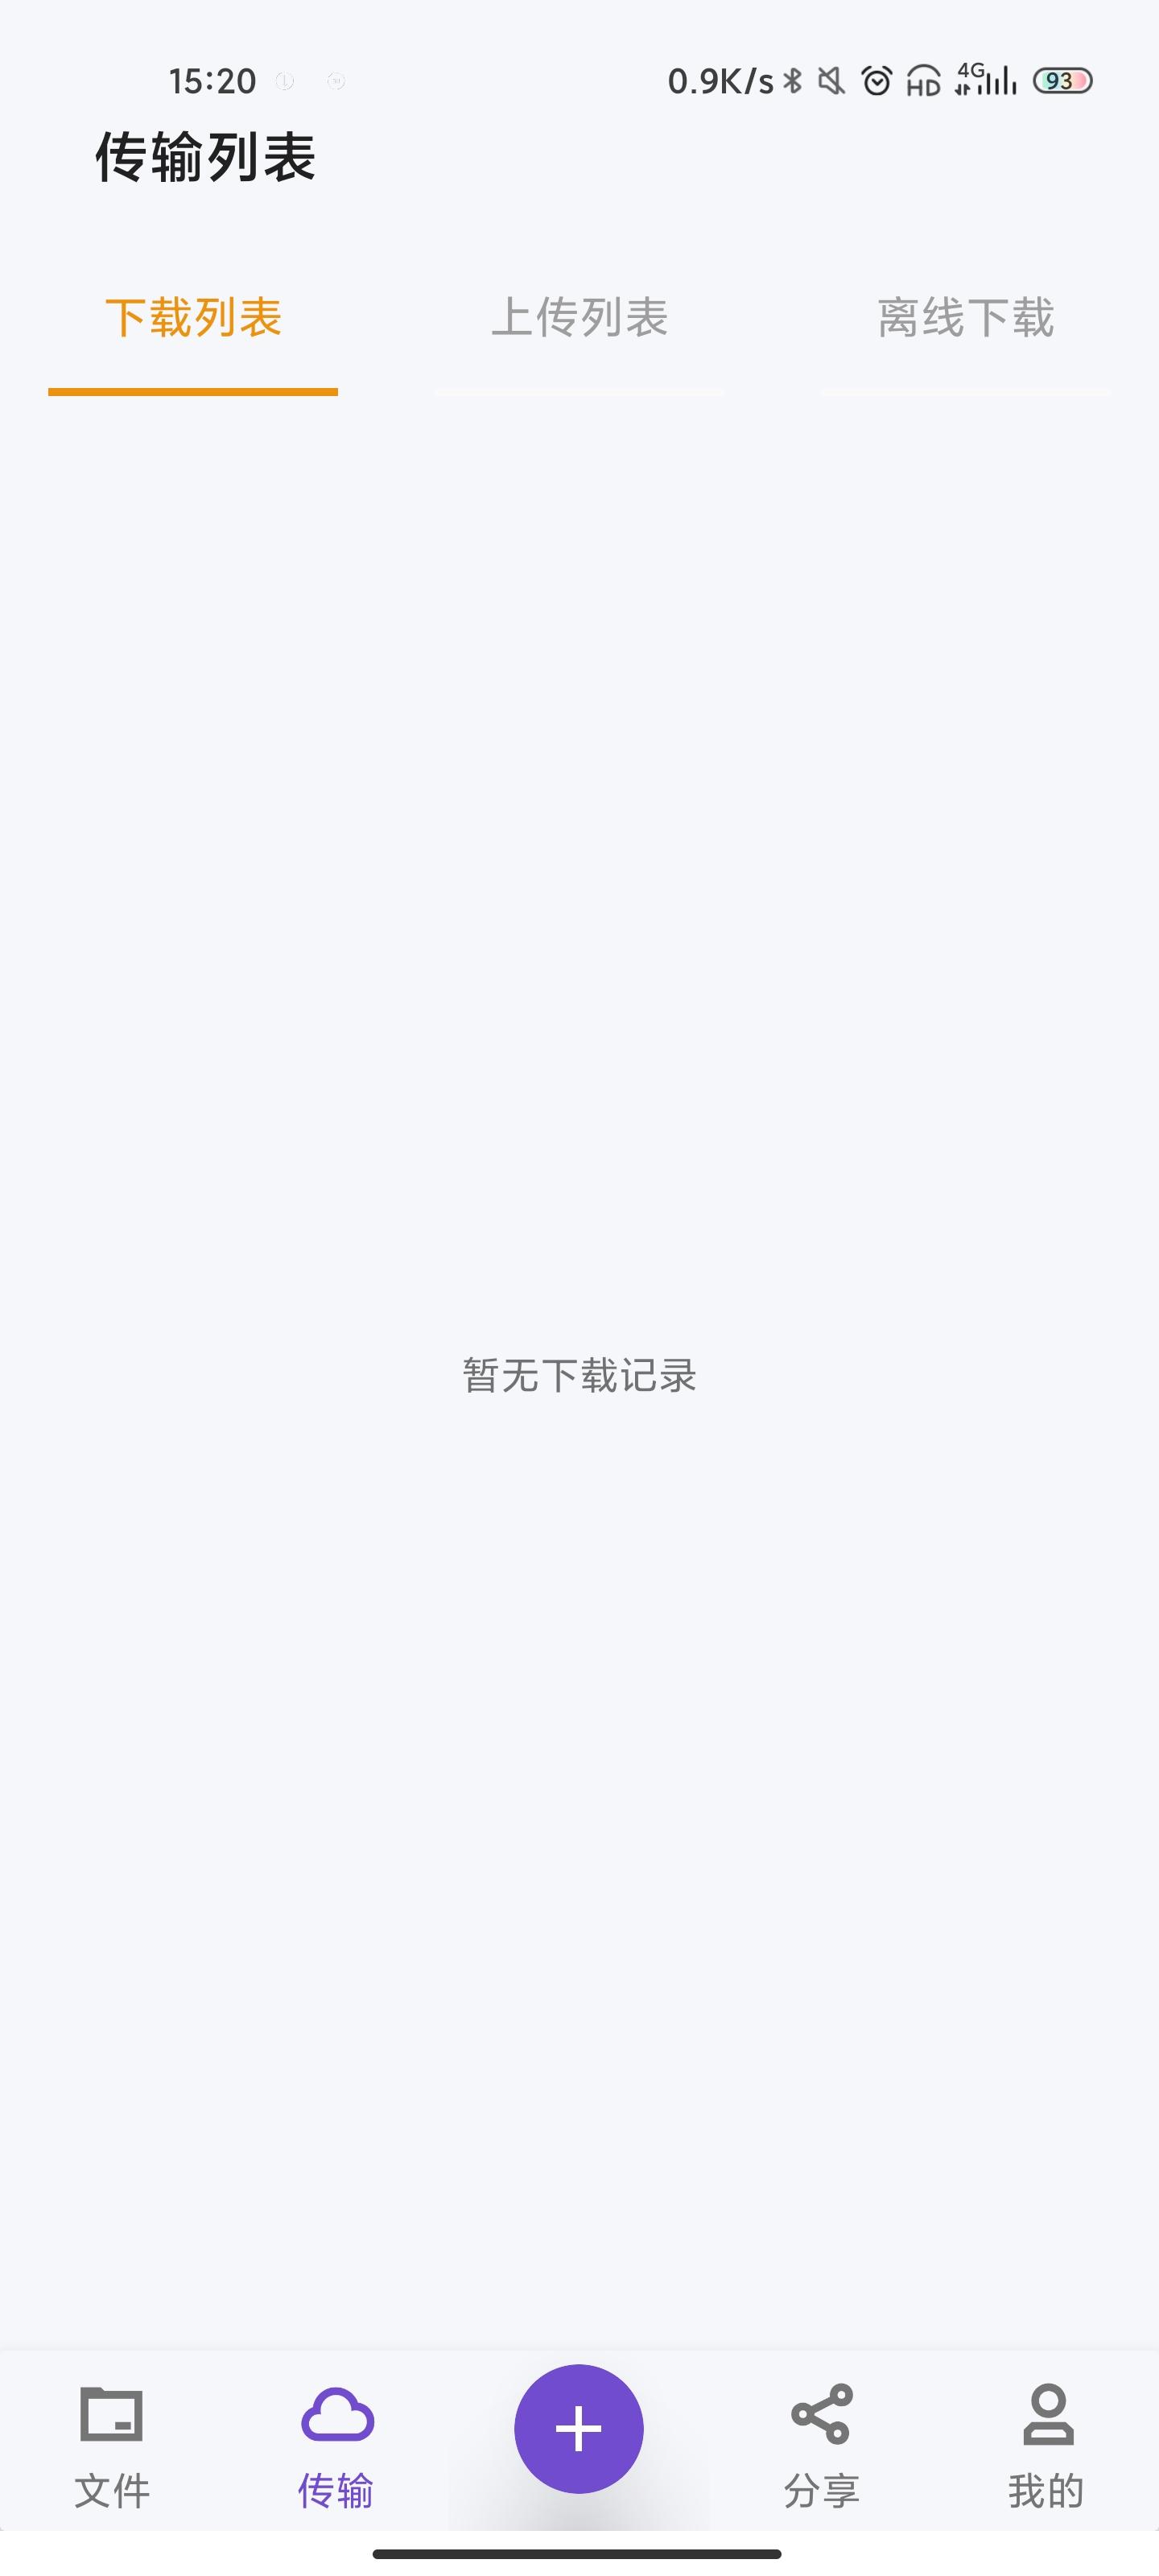 rBAAdmB0LKeAcIKaAAKNEbT0rsY885.jpg插图(2)